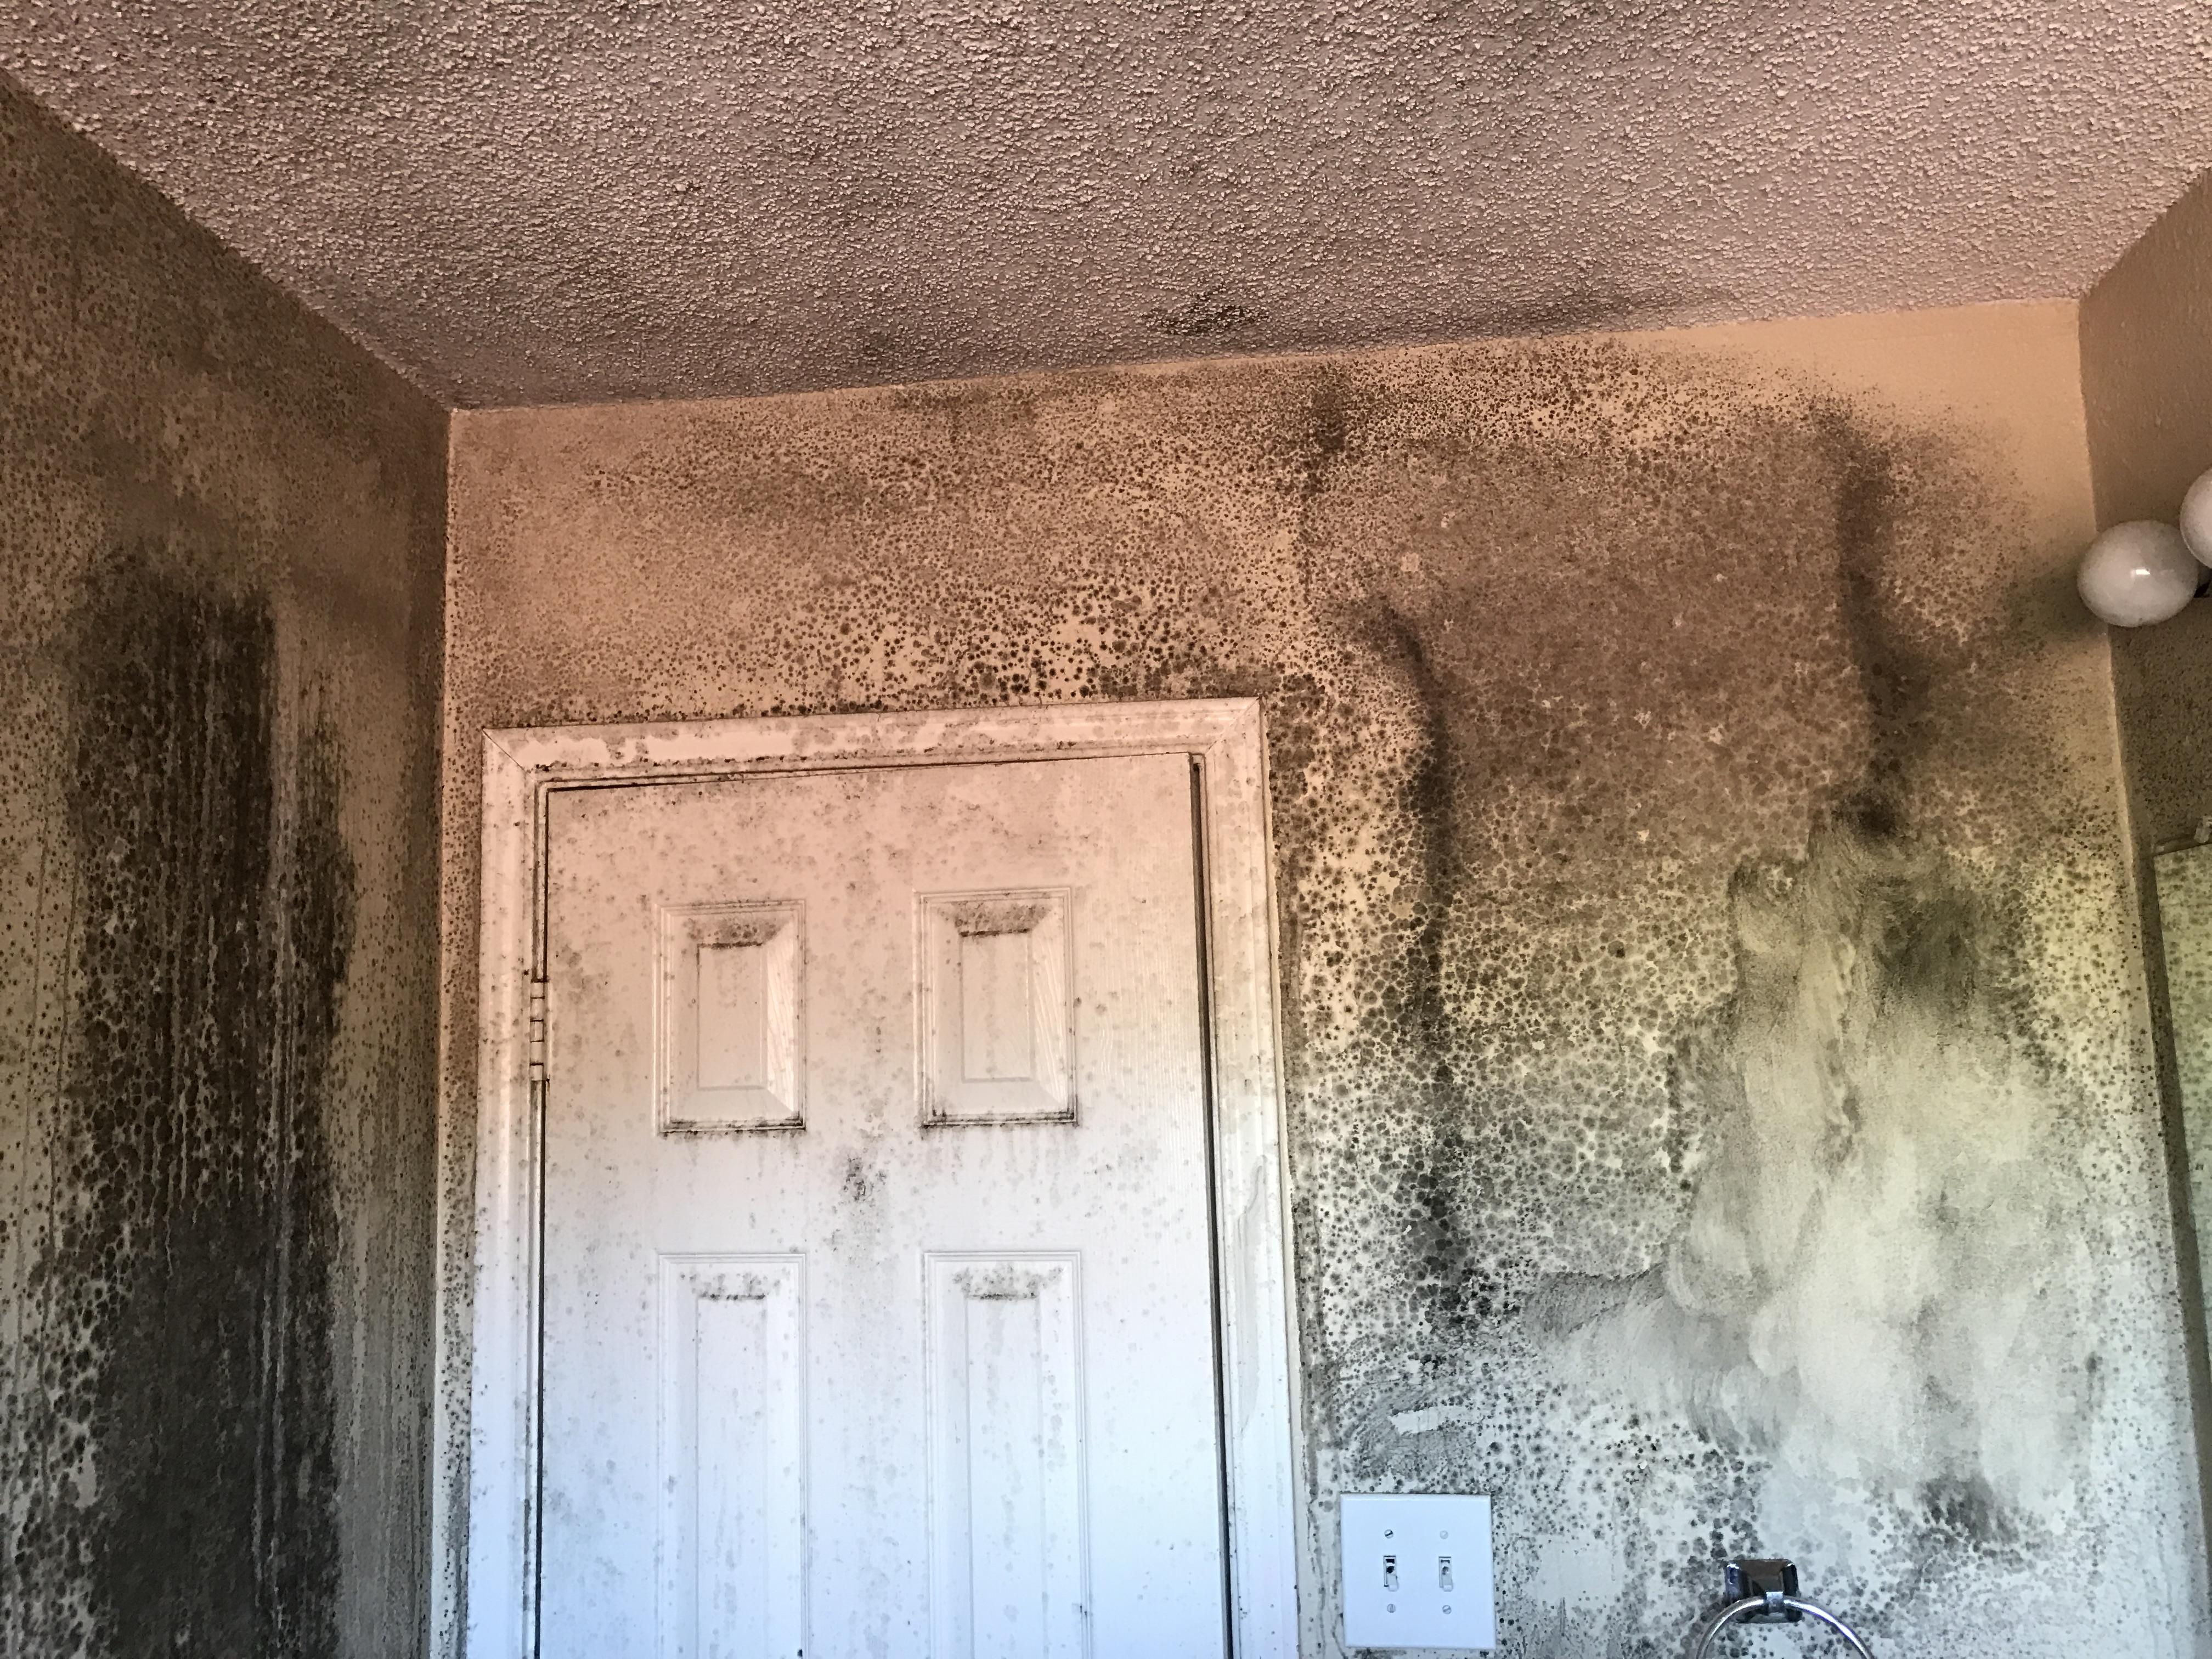 Texas Mold Testing